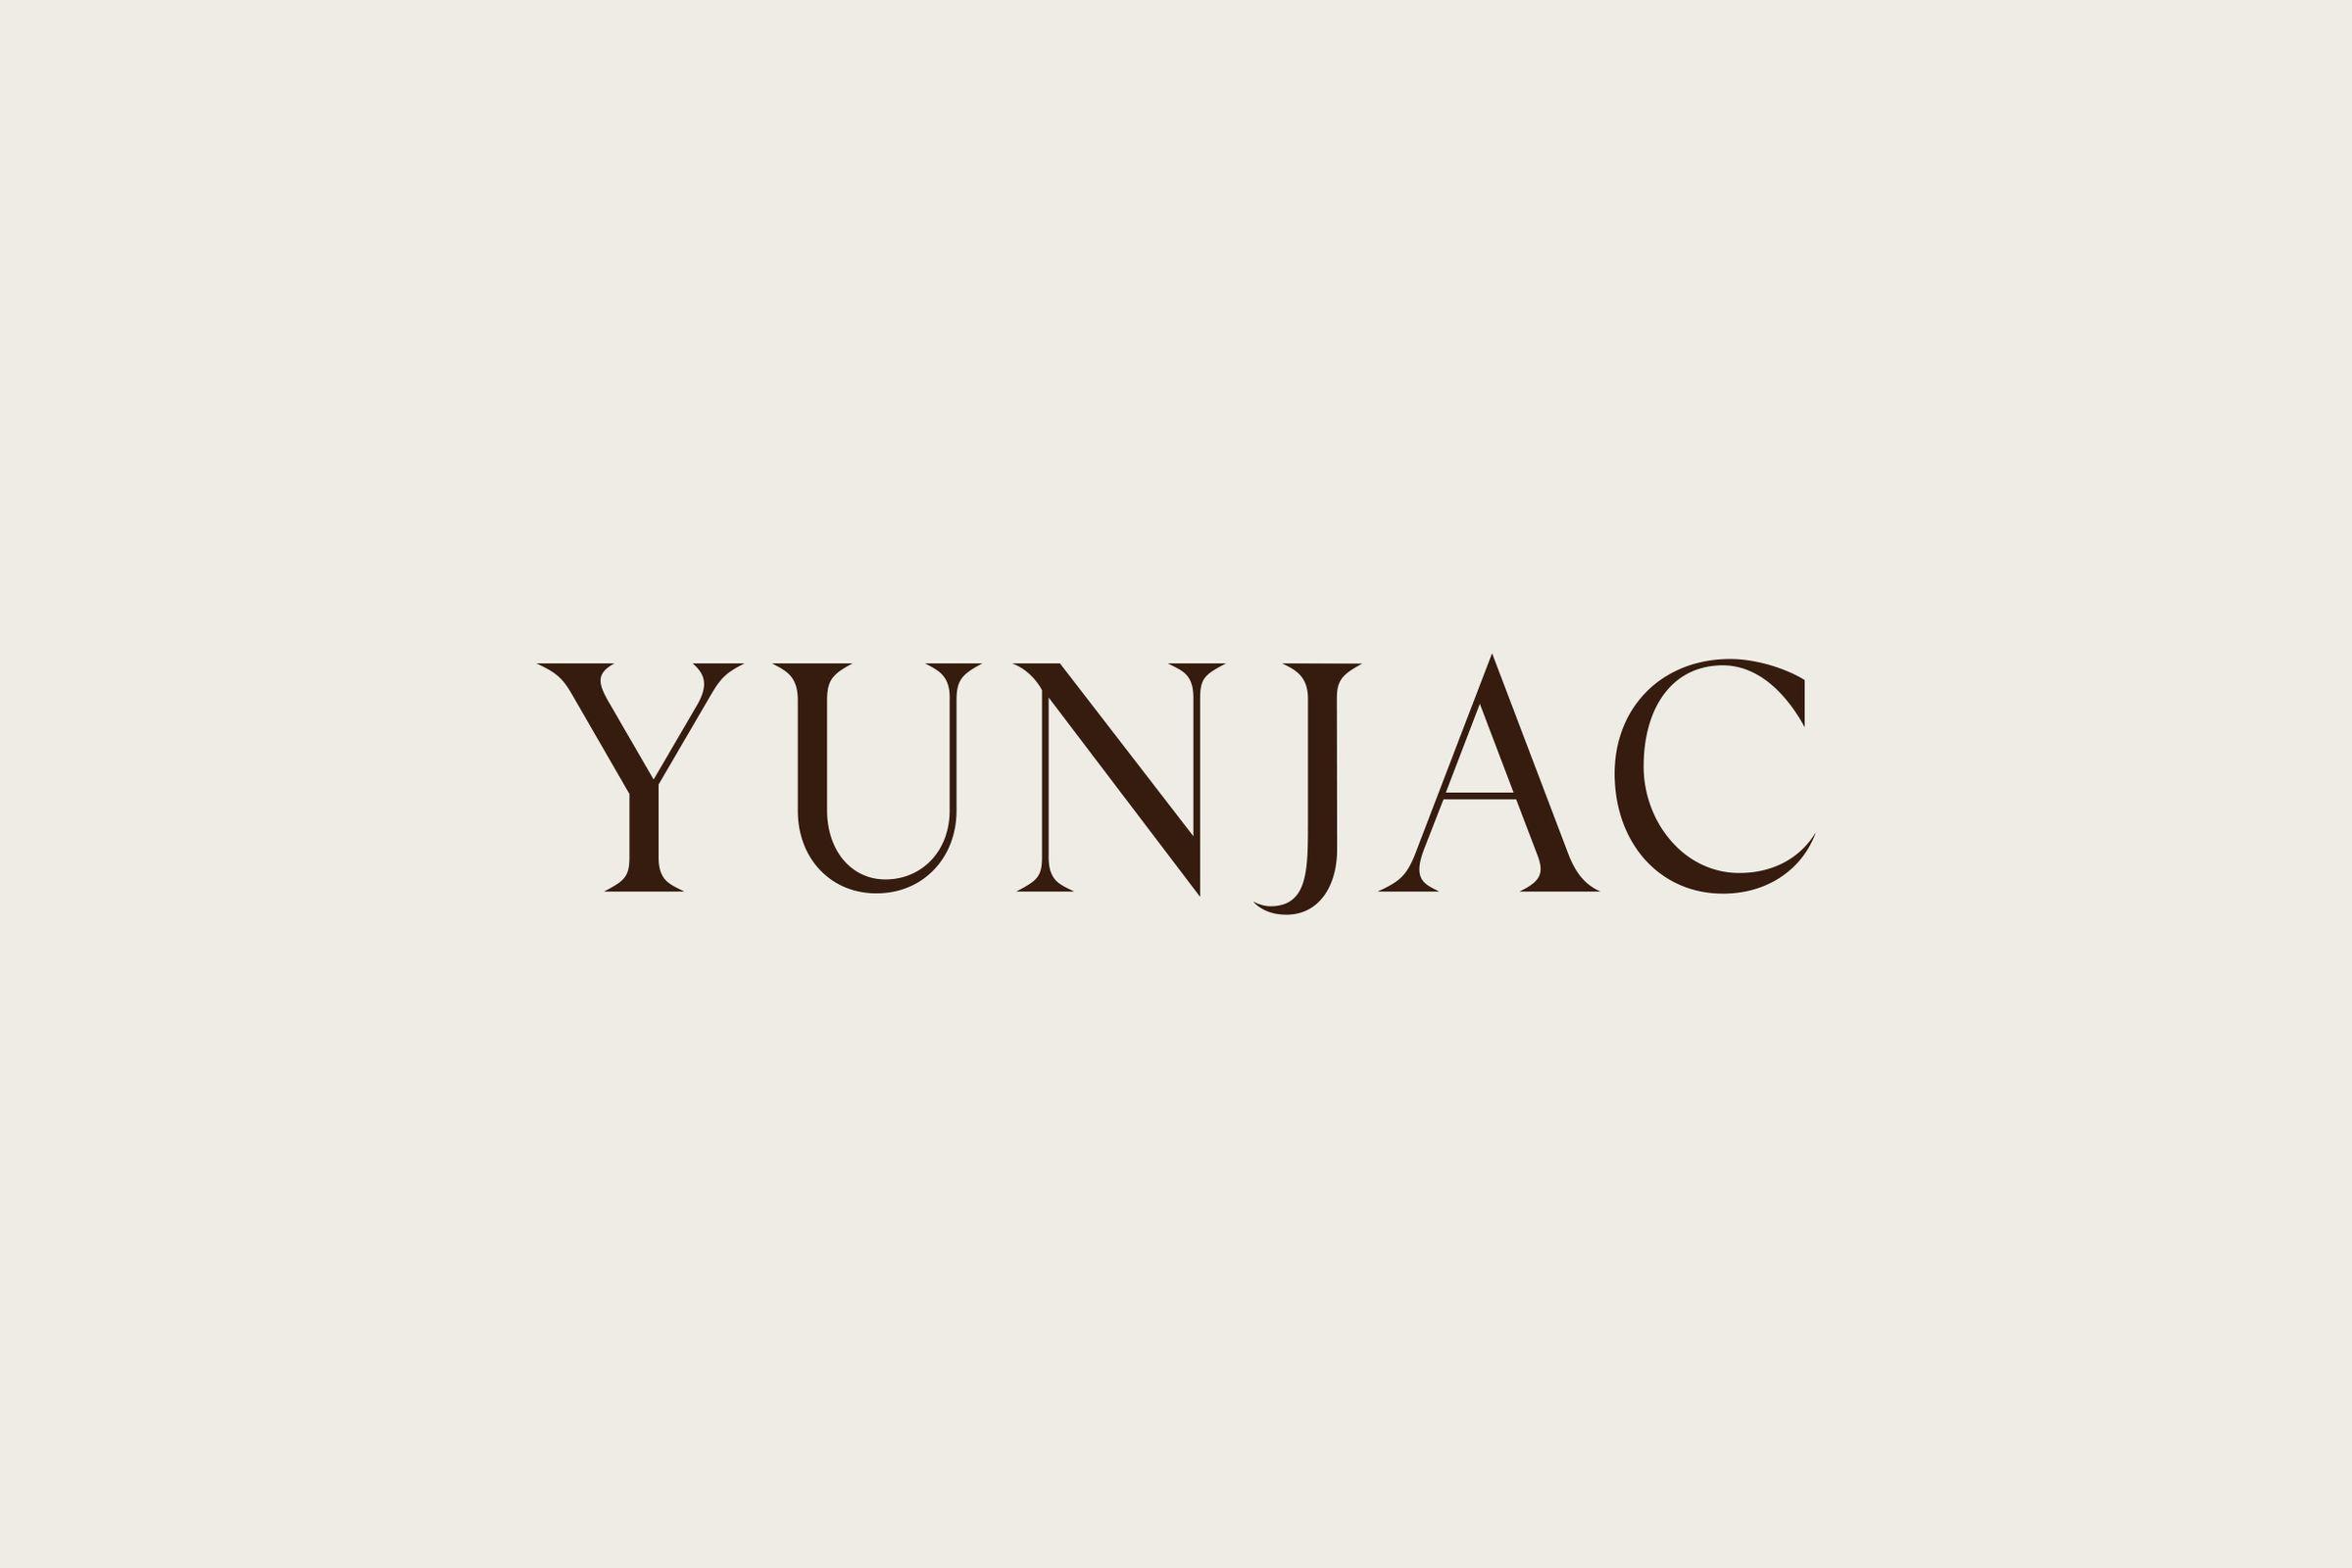 Yunjac logo